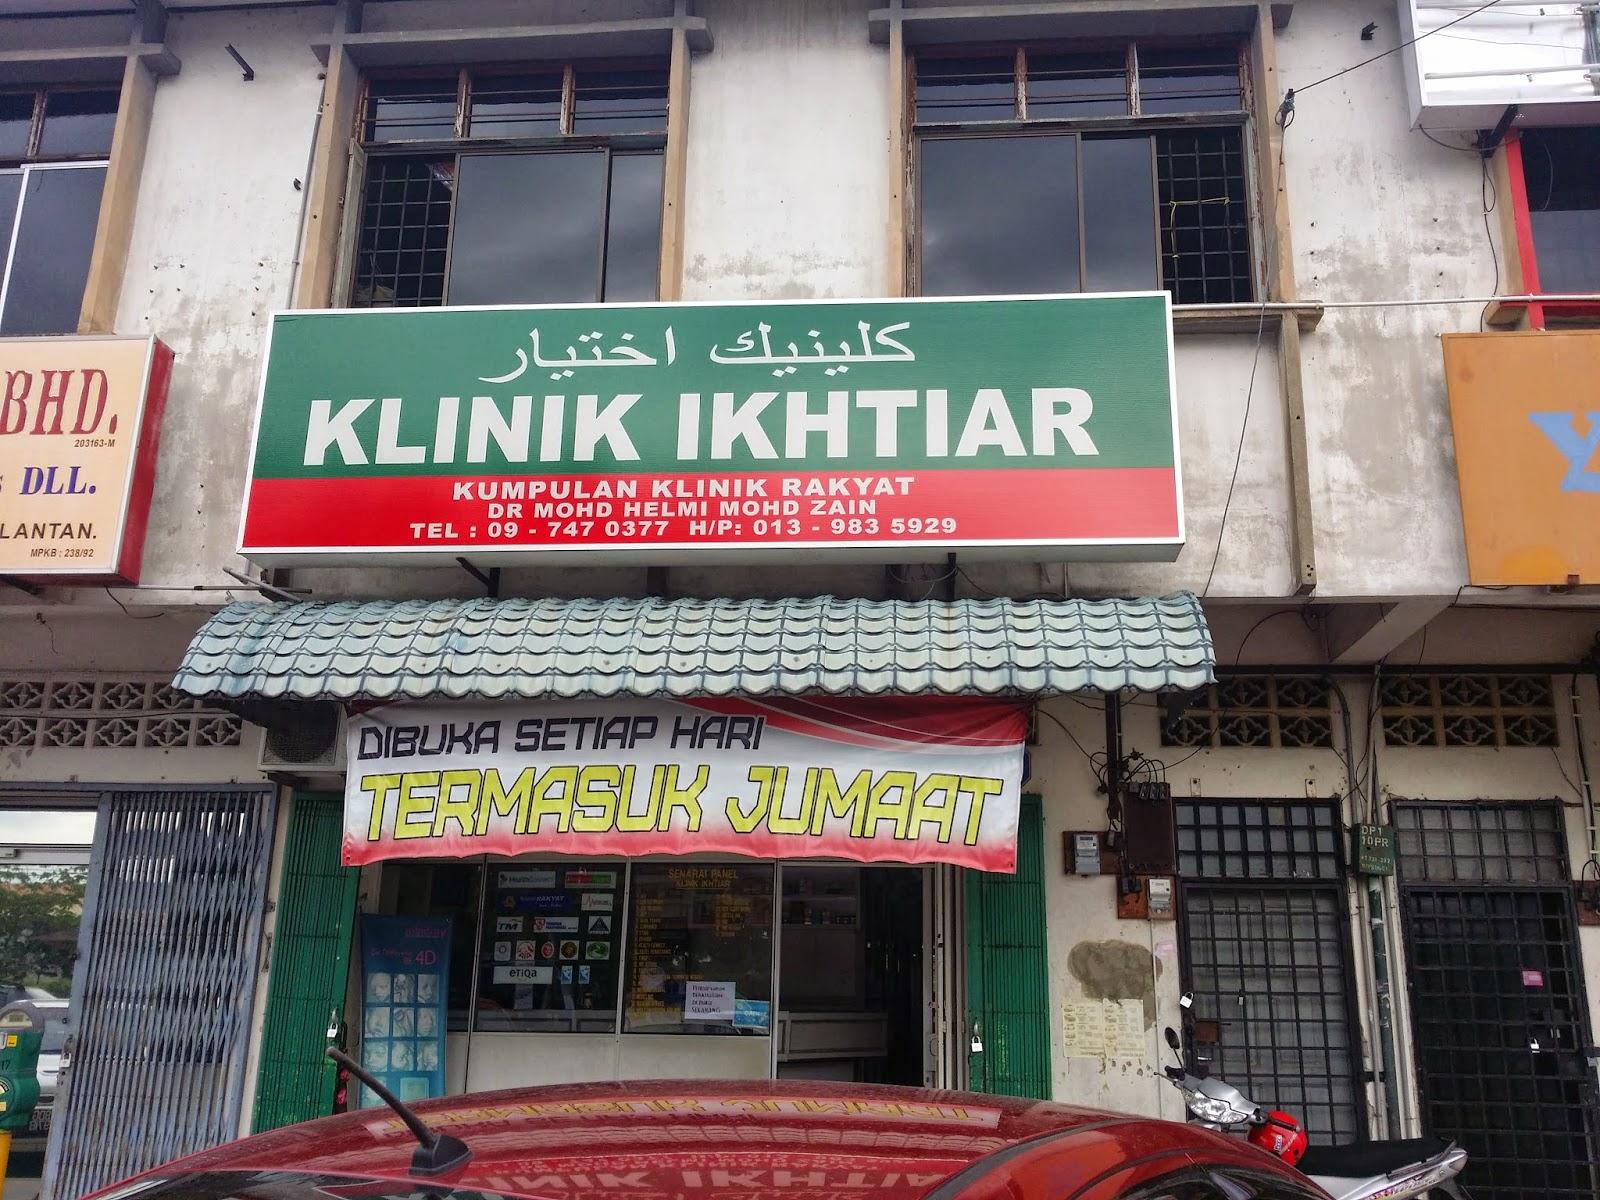 klinik ikhtiar, klinik di kota bharu, klinik ikhtiar wakaf che yeh, no telefon klinik ikhtiar,